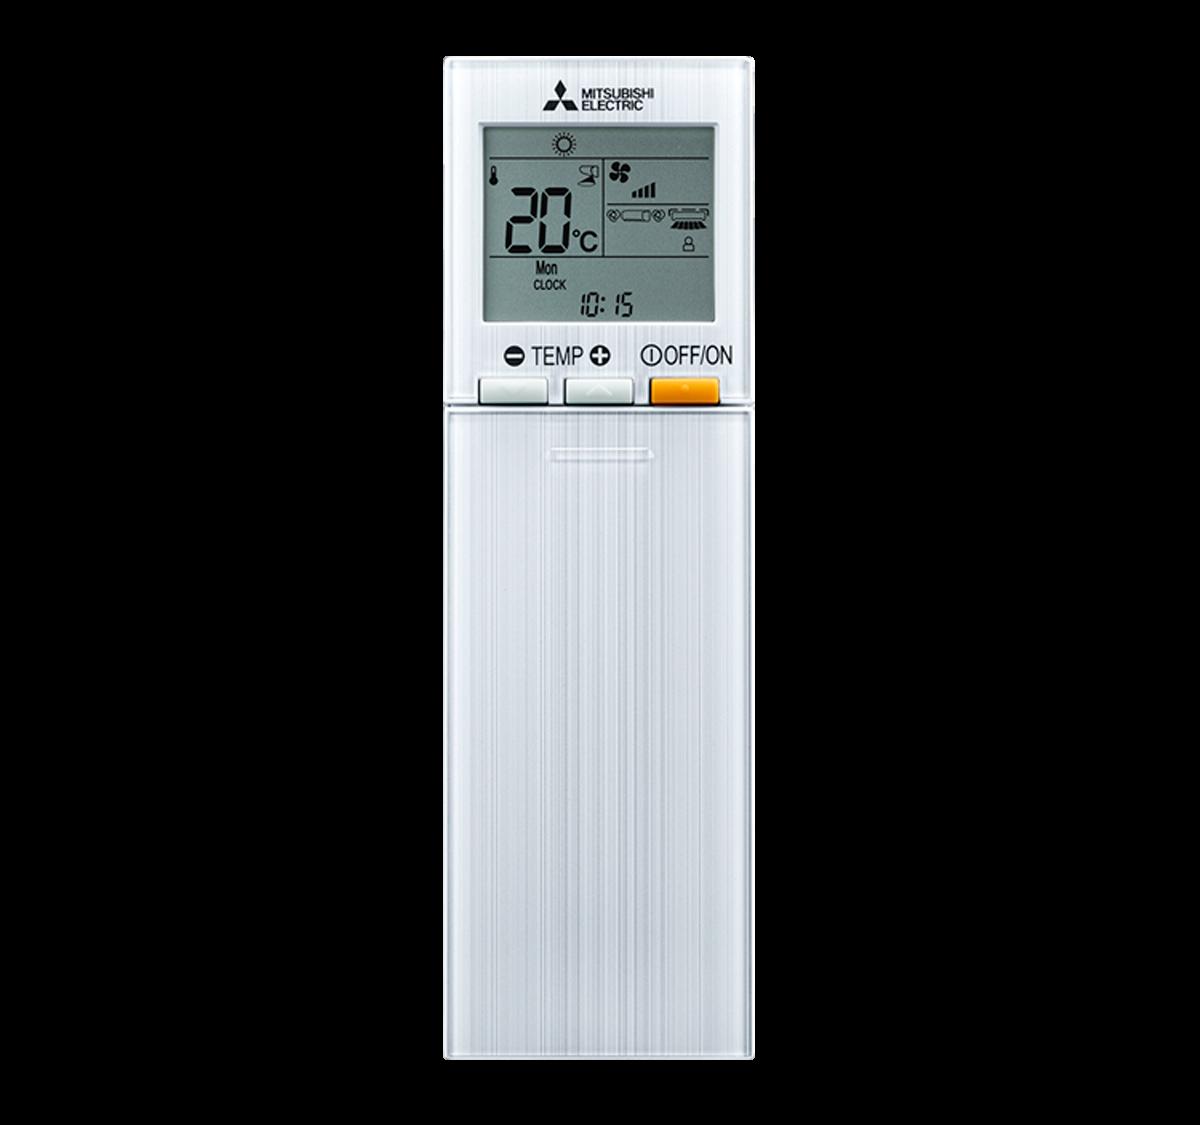 aire acondicionado conjunto split mitsubishi electric inverter mando a diastanacia serie kirigamine style modelo msz ln25vgv precio incluido instalacion caseragua 01